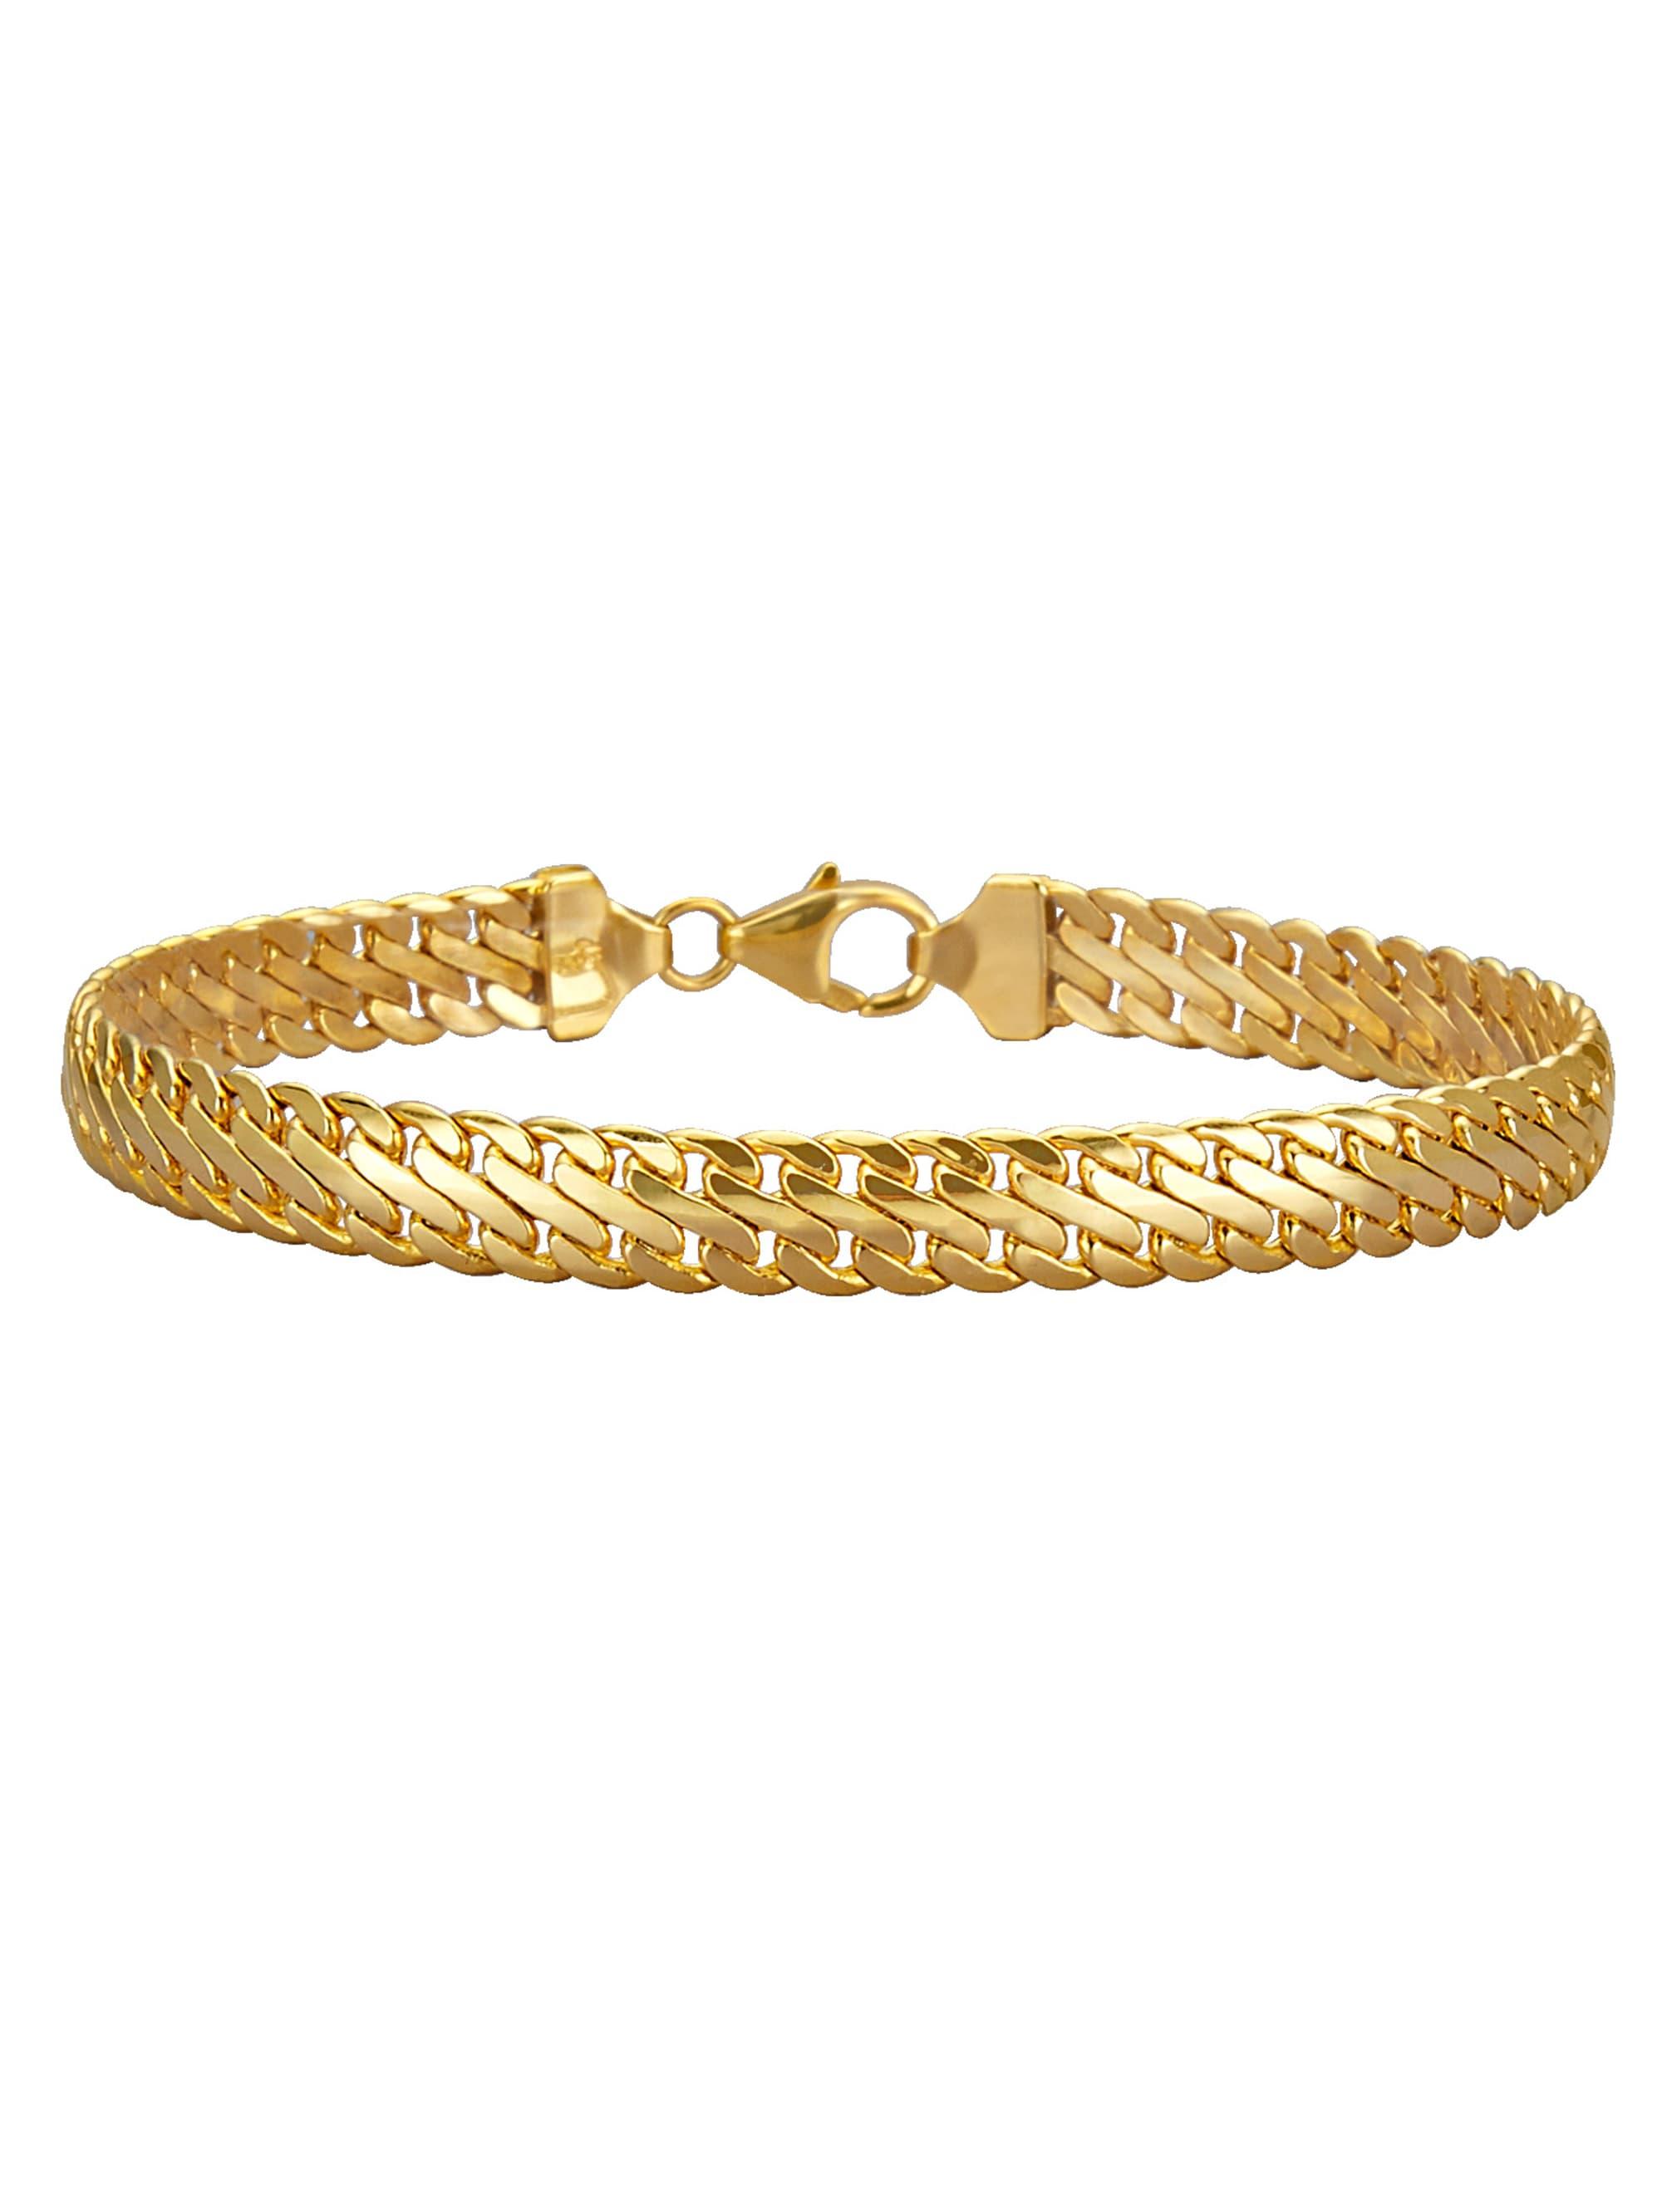 Diemer Gold Armband in Gelbgold S41d9